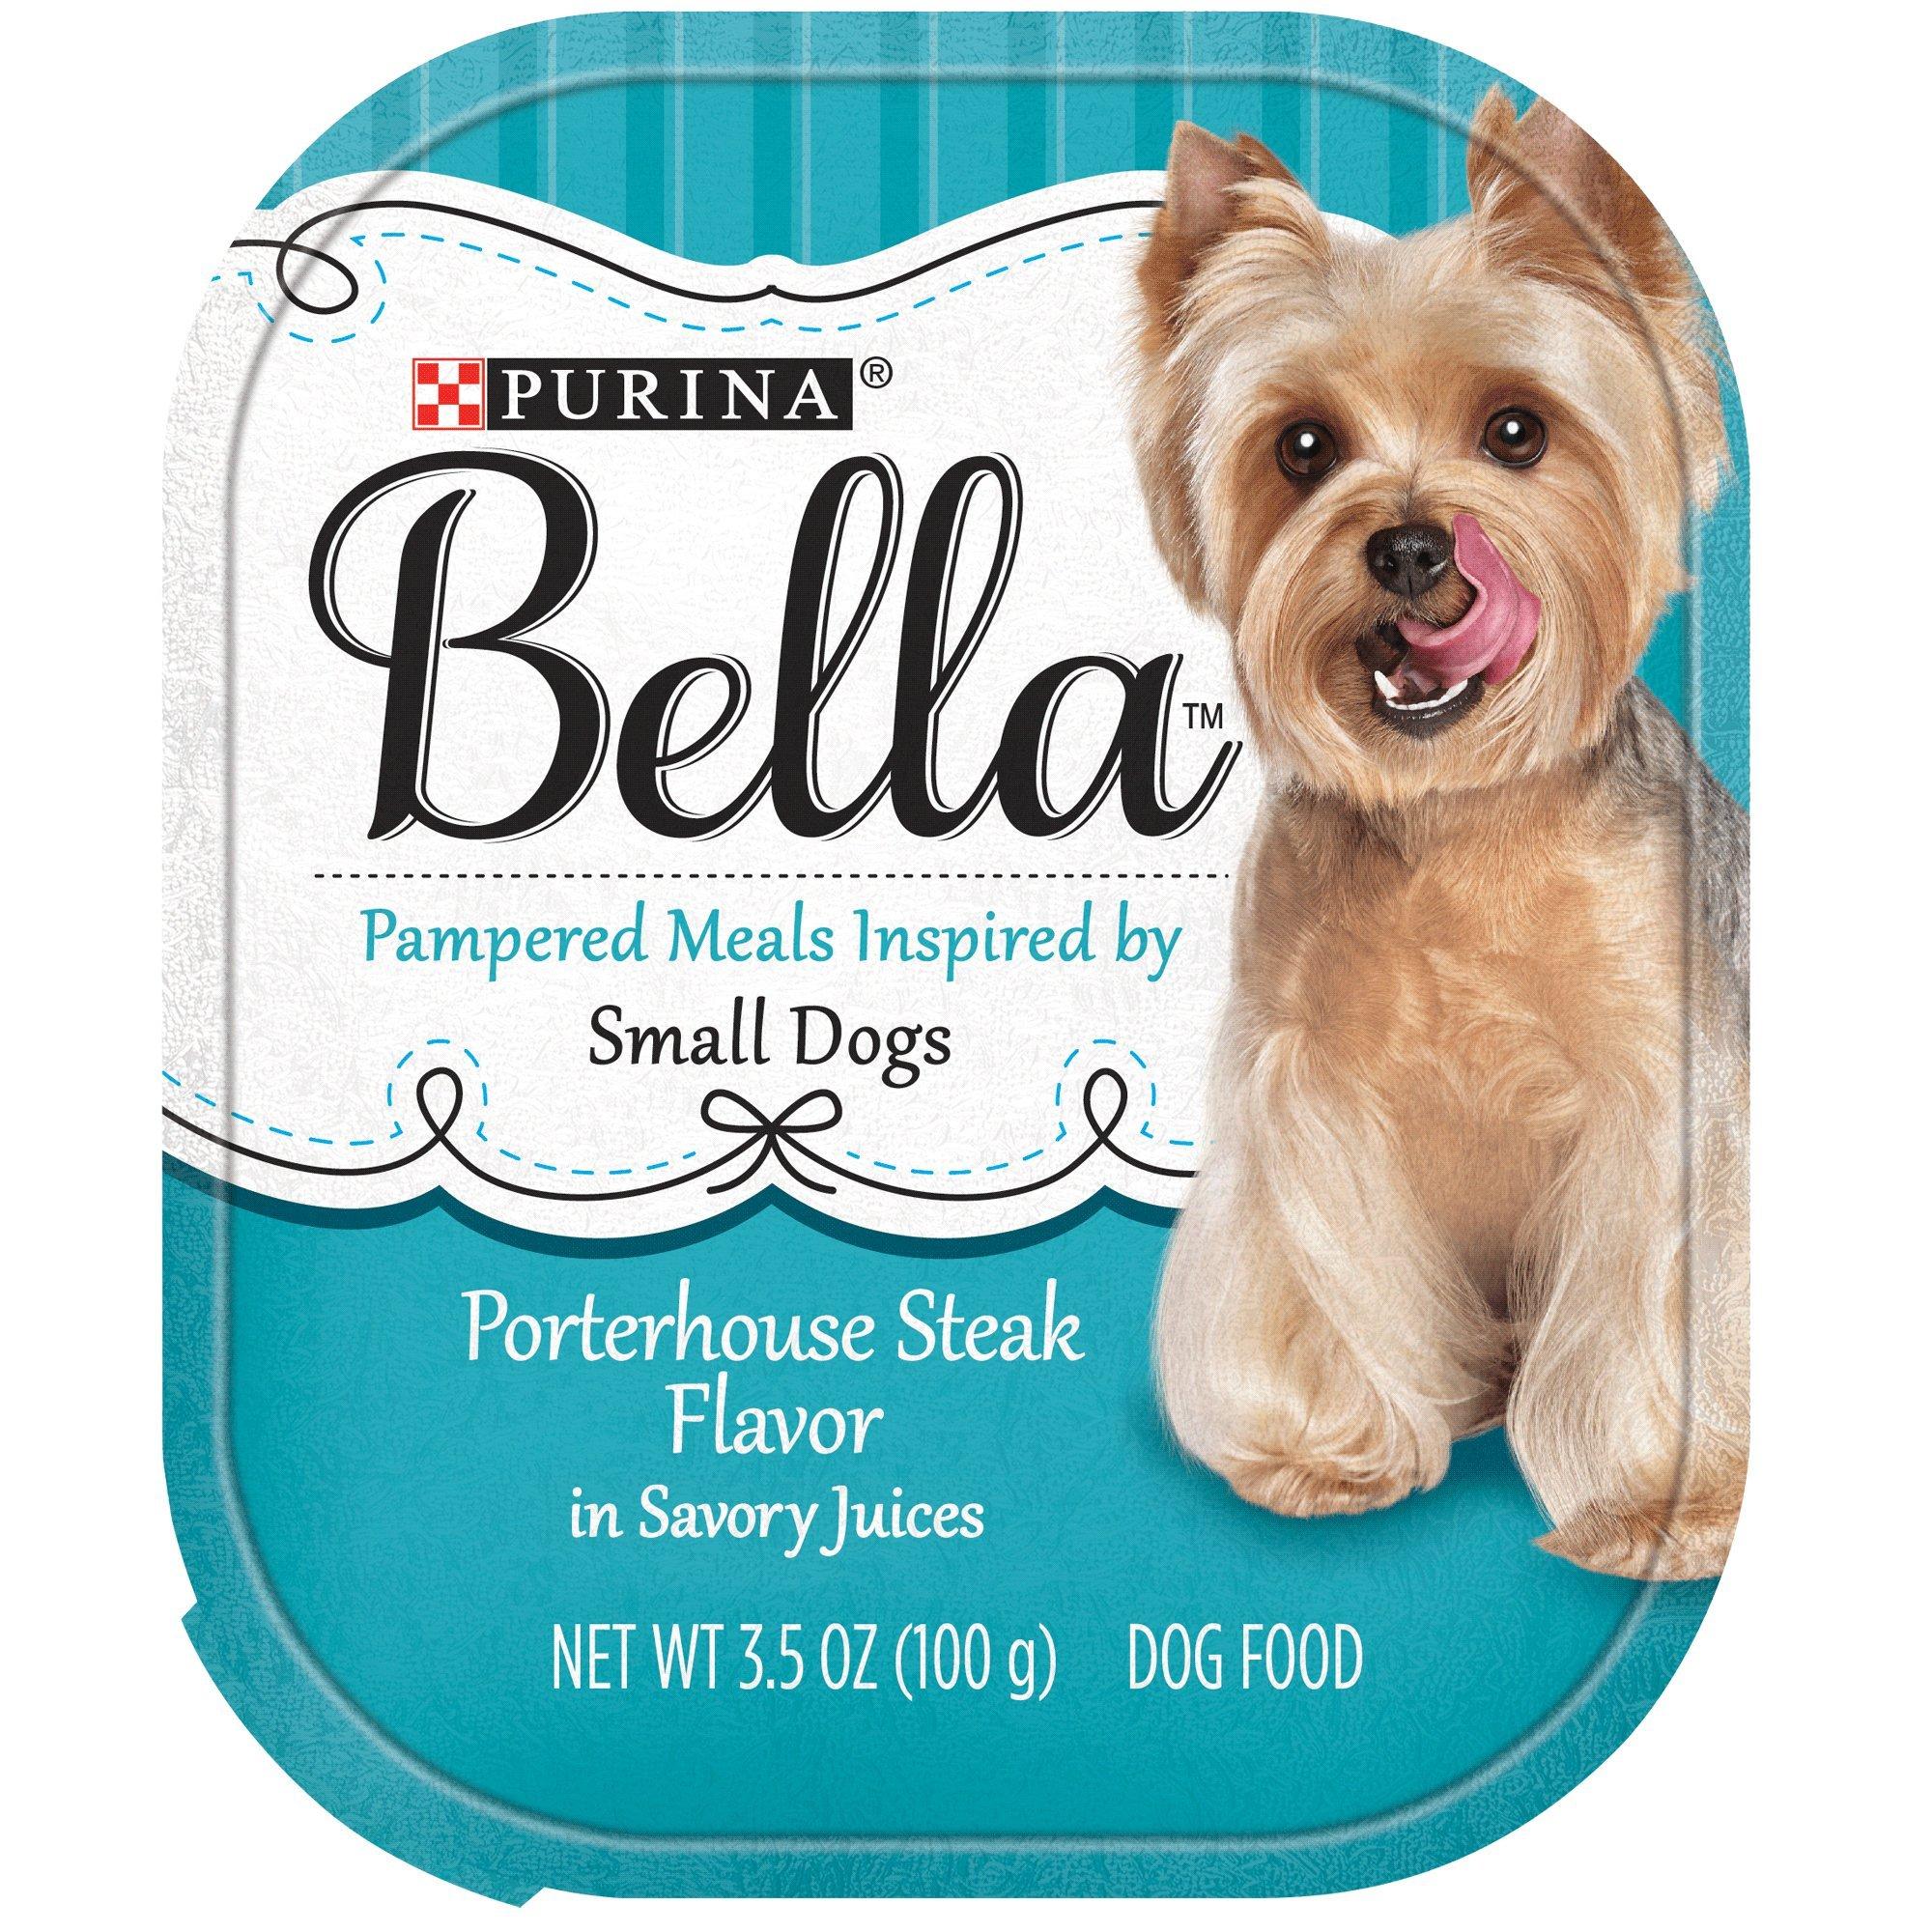 Purina Bella Porterhouse Steak Flavor in Savory Juices Adult Wet Dog Food - 3.5 oz. (1) Single Tray (Porterhouse Steak, Single 3.5 oz. Piece)